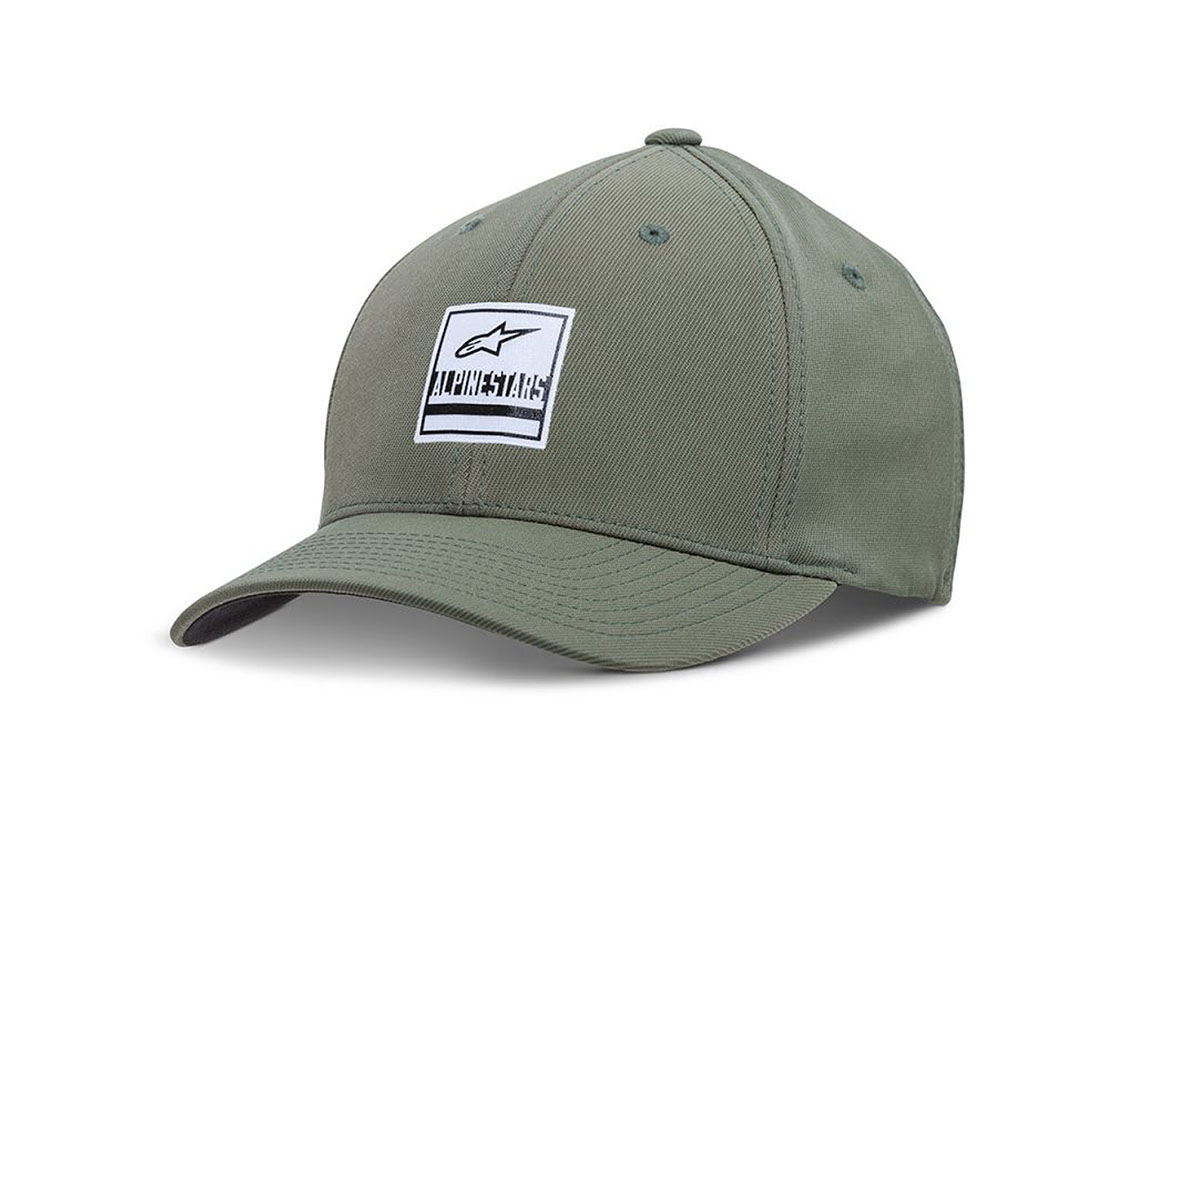 TwentyFour Store silicon cap image facing front